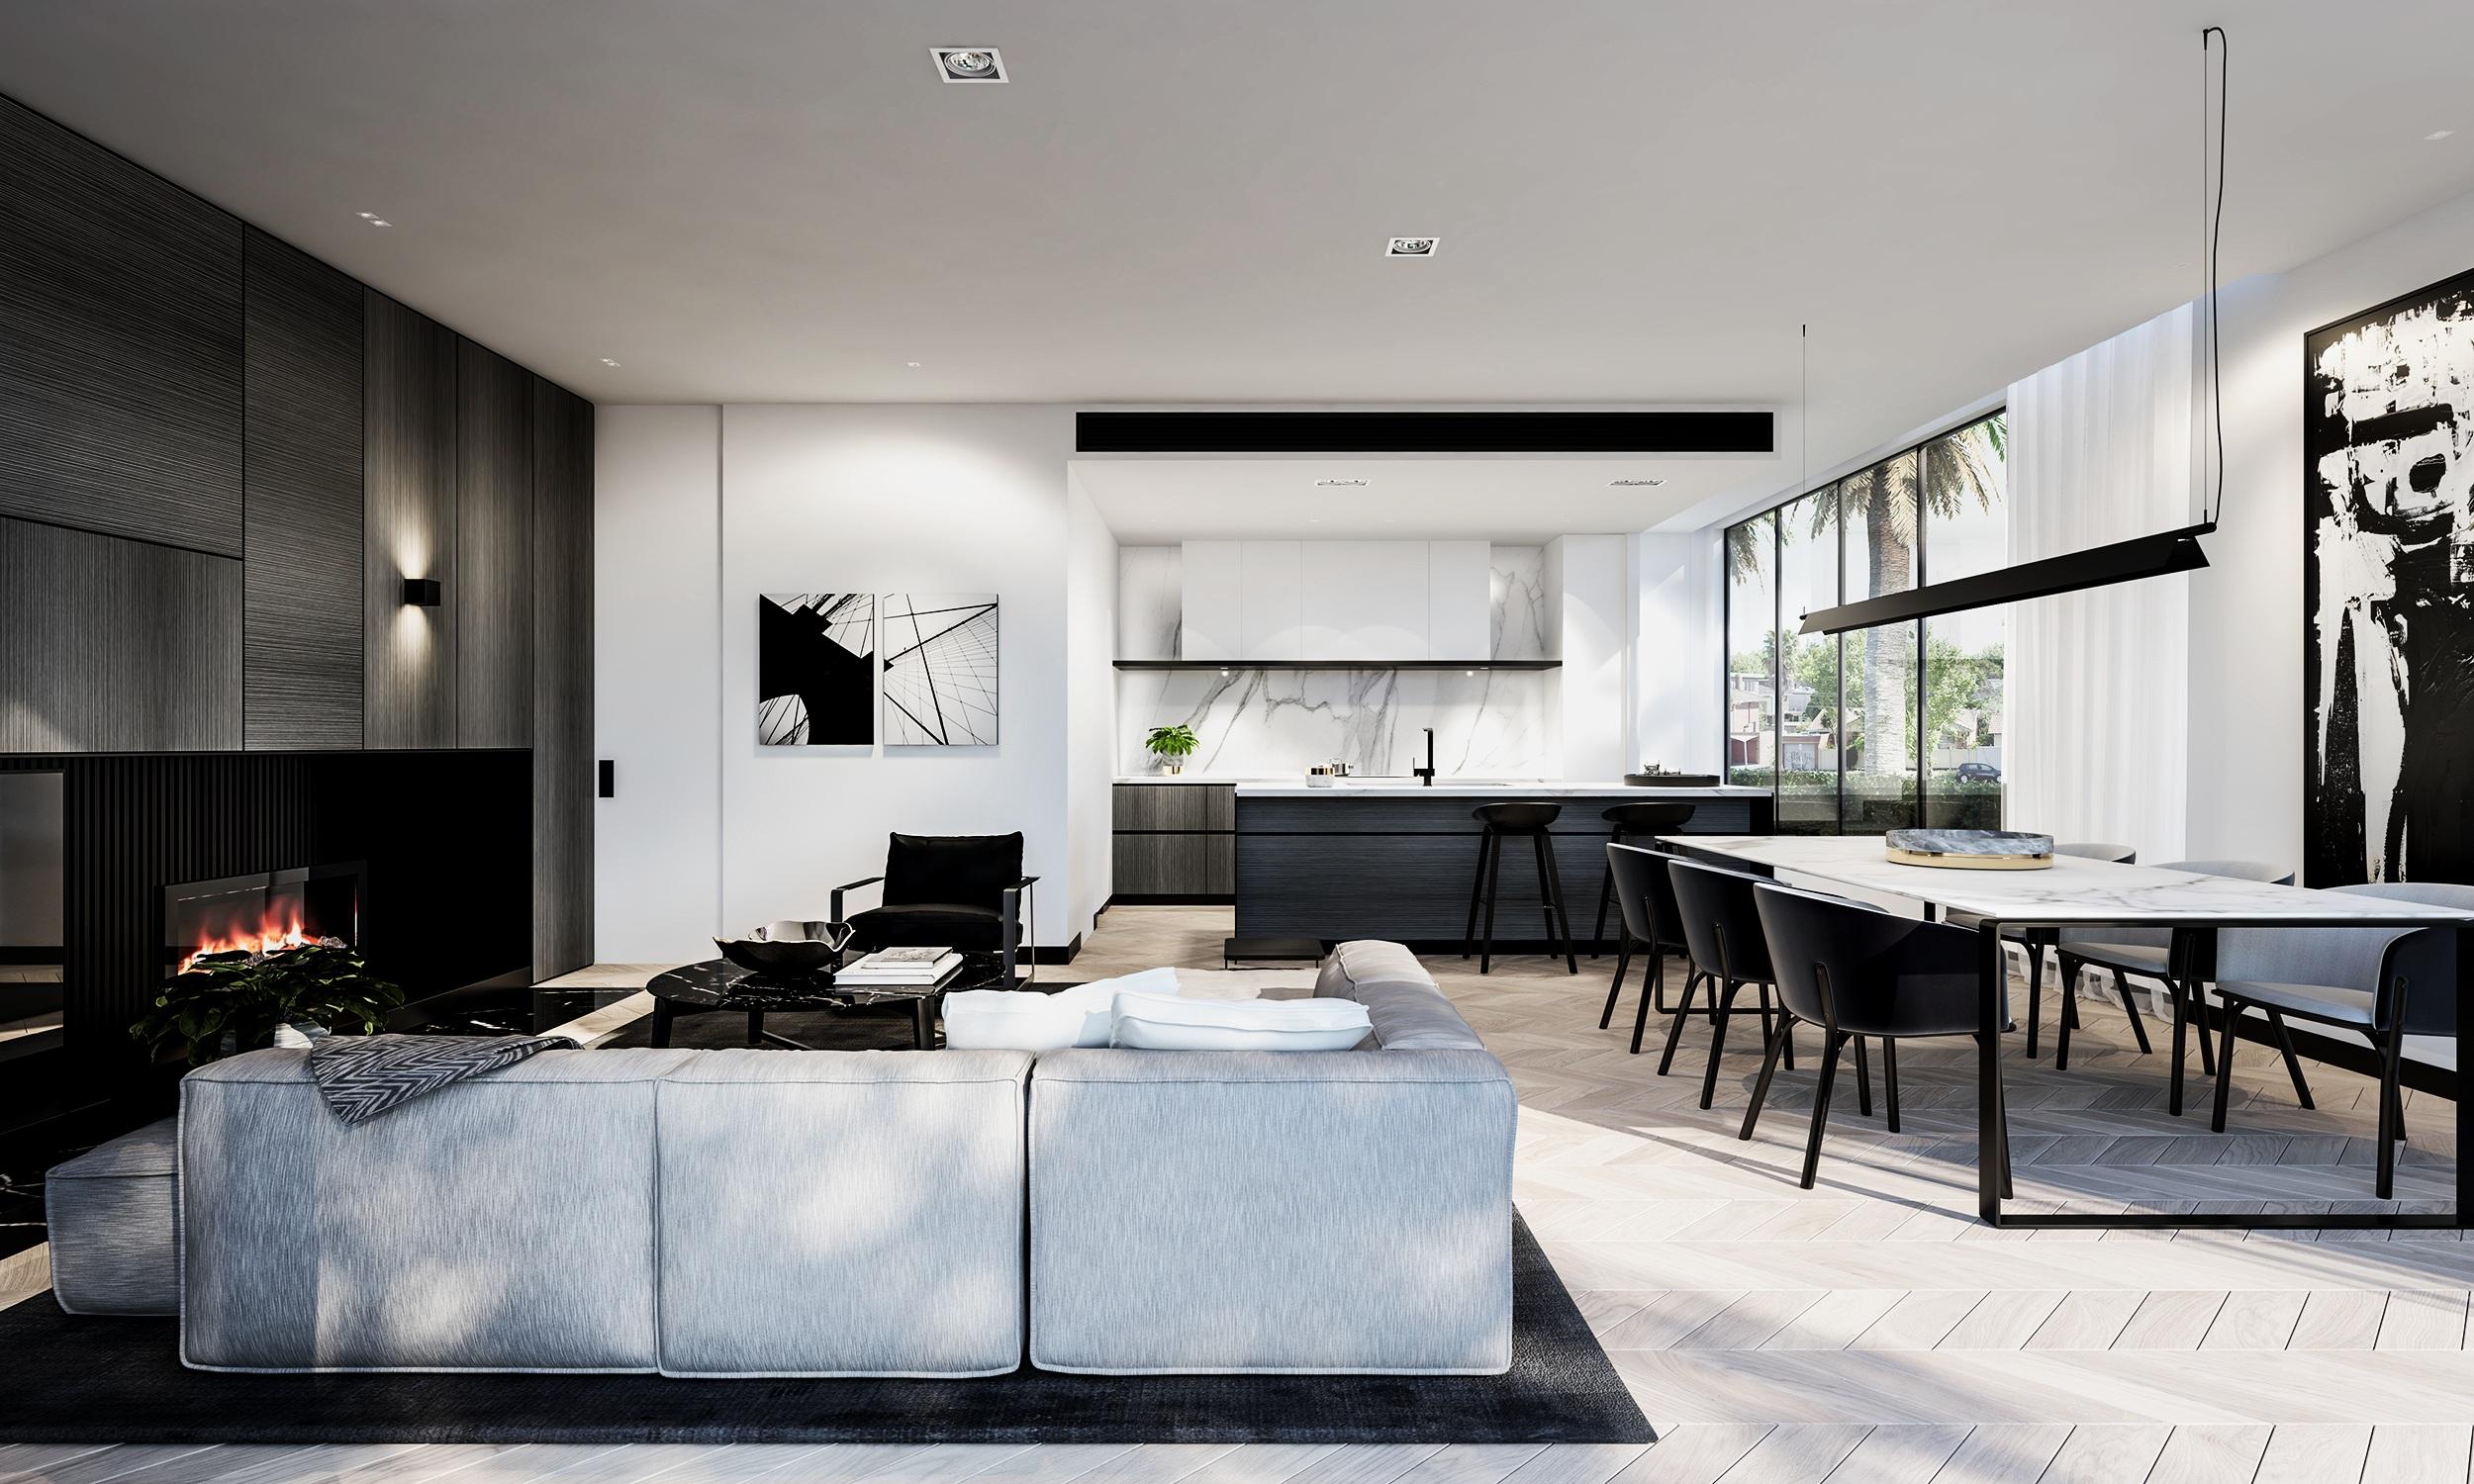 Goldsmith Street - Apartment 1 Lounge In MR.jpg